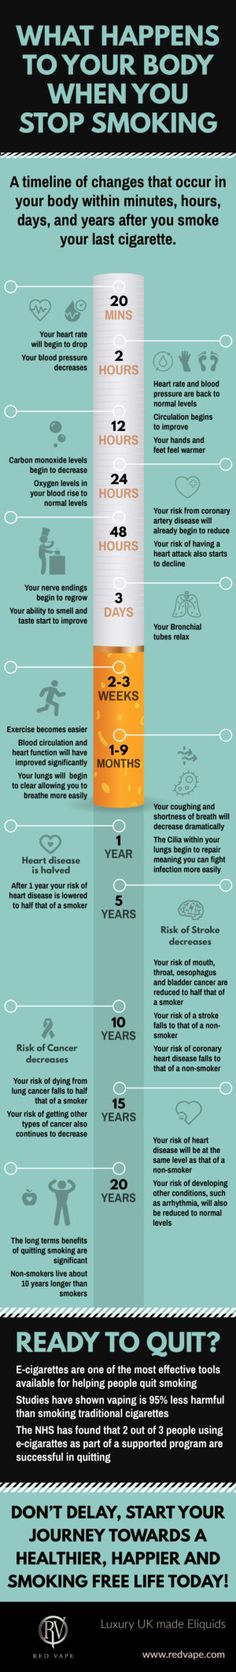 quit-smoking-infographic